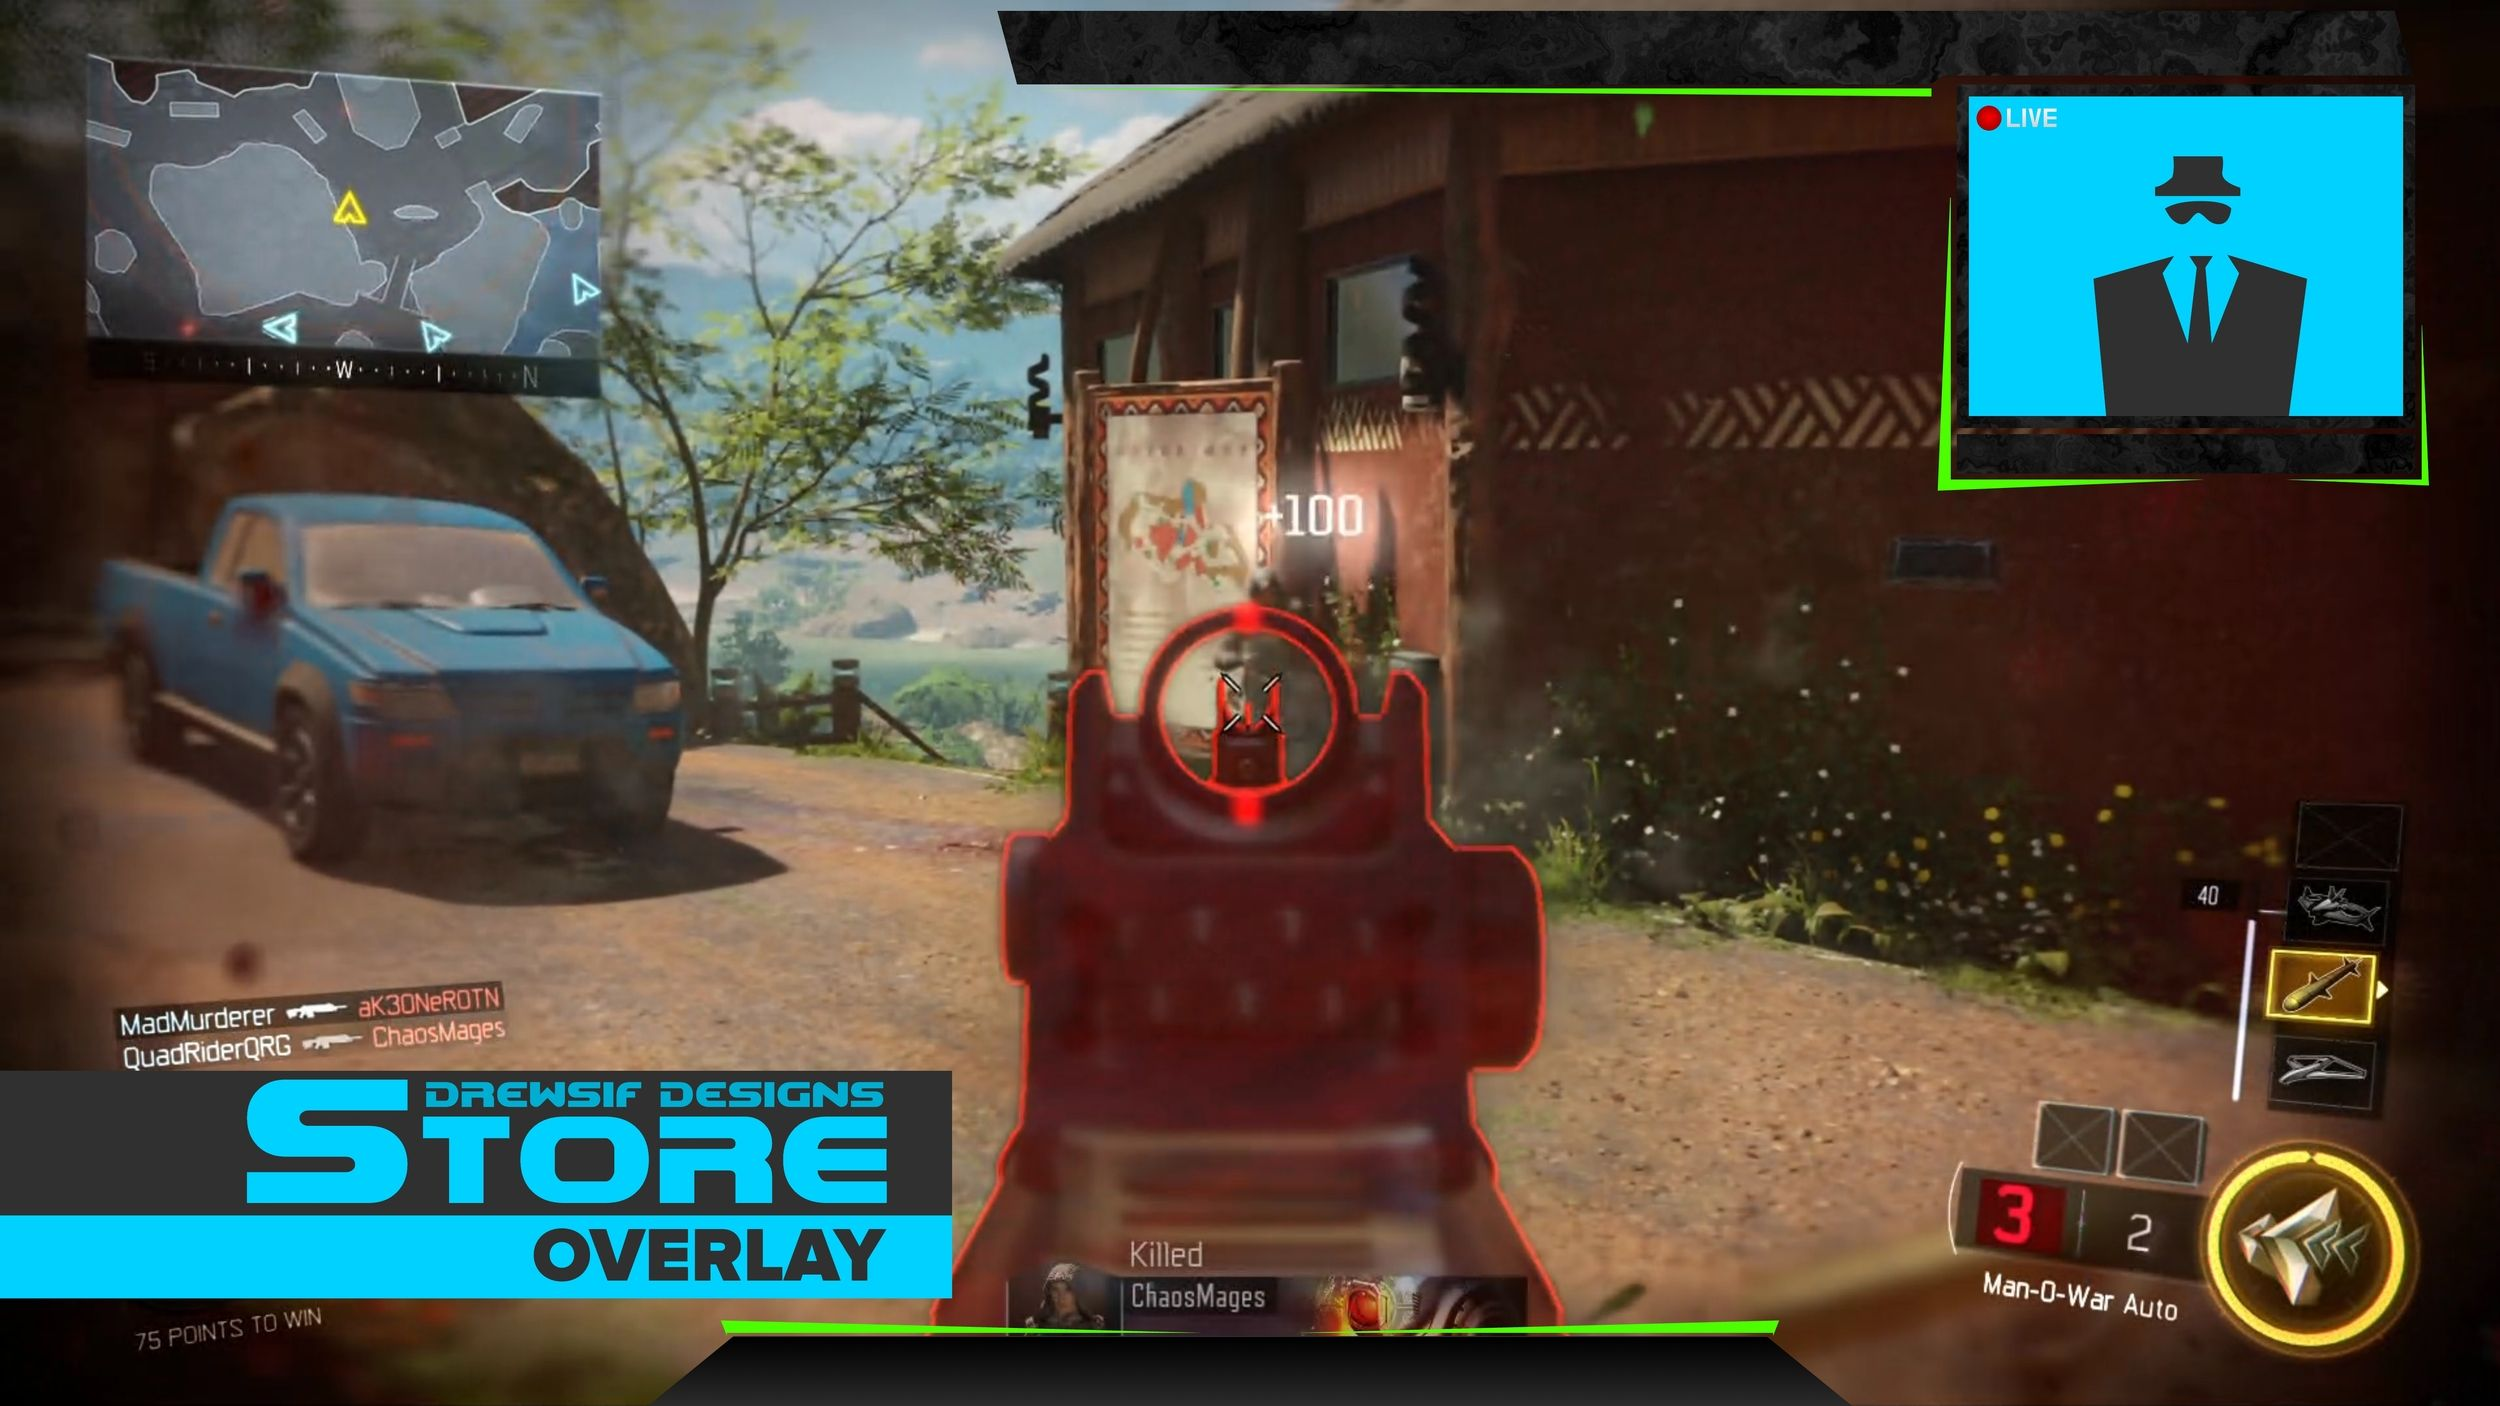 Live Stream Overlay Cod Lime Green 1 — Drewsif Designs